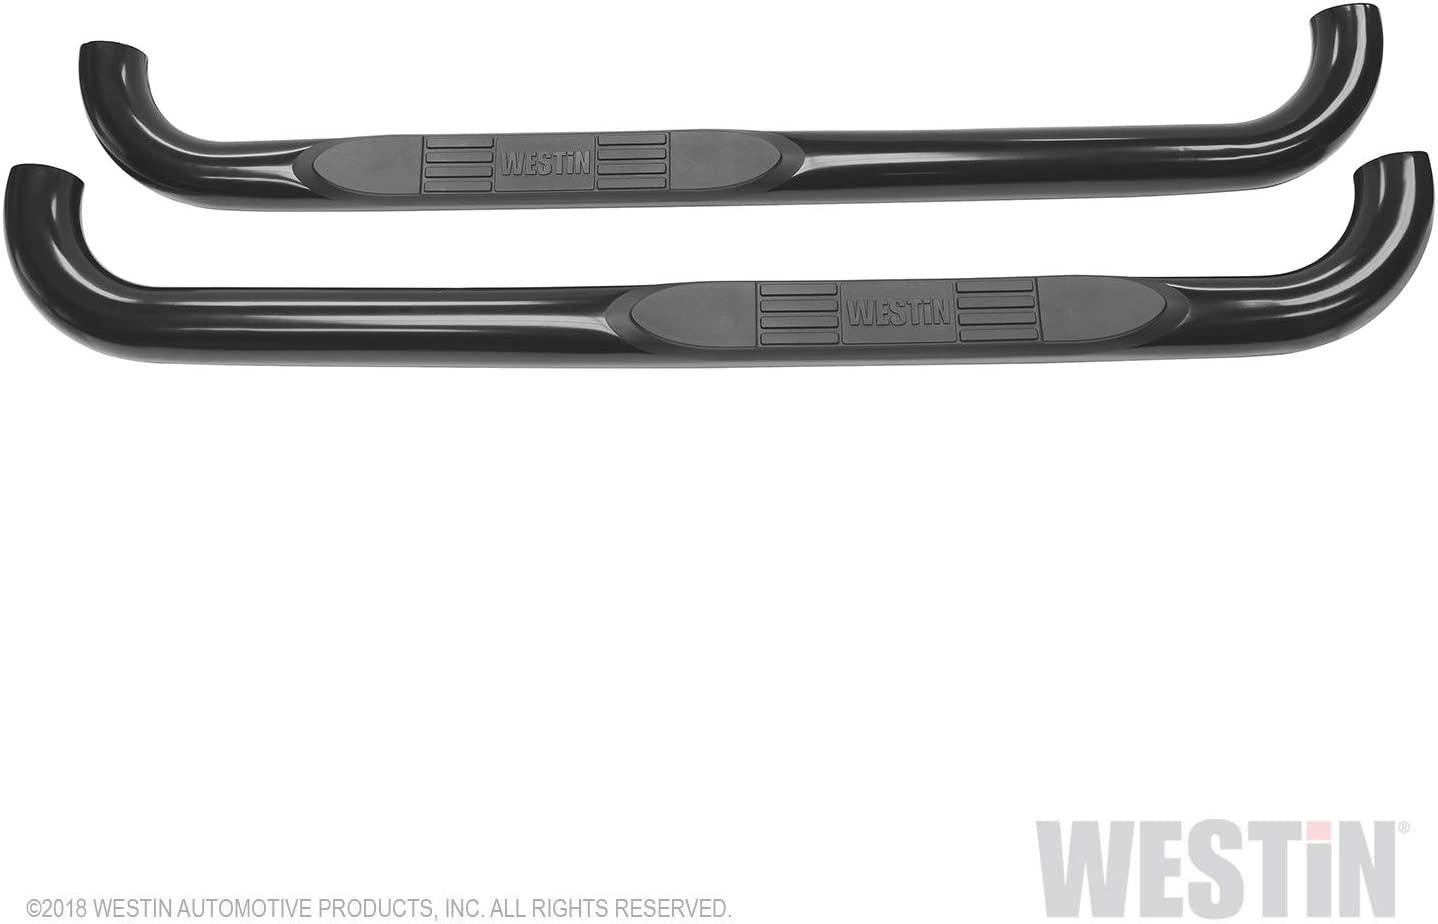 Westin 23-2325 E-Series Black Side Steps 54 Length